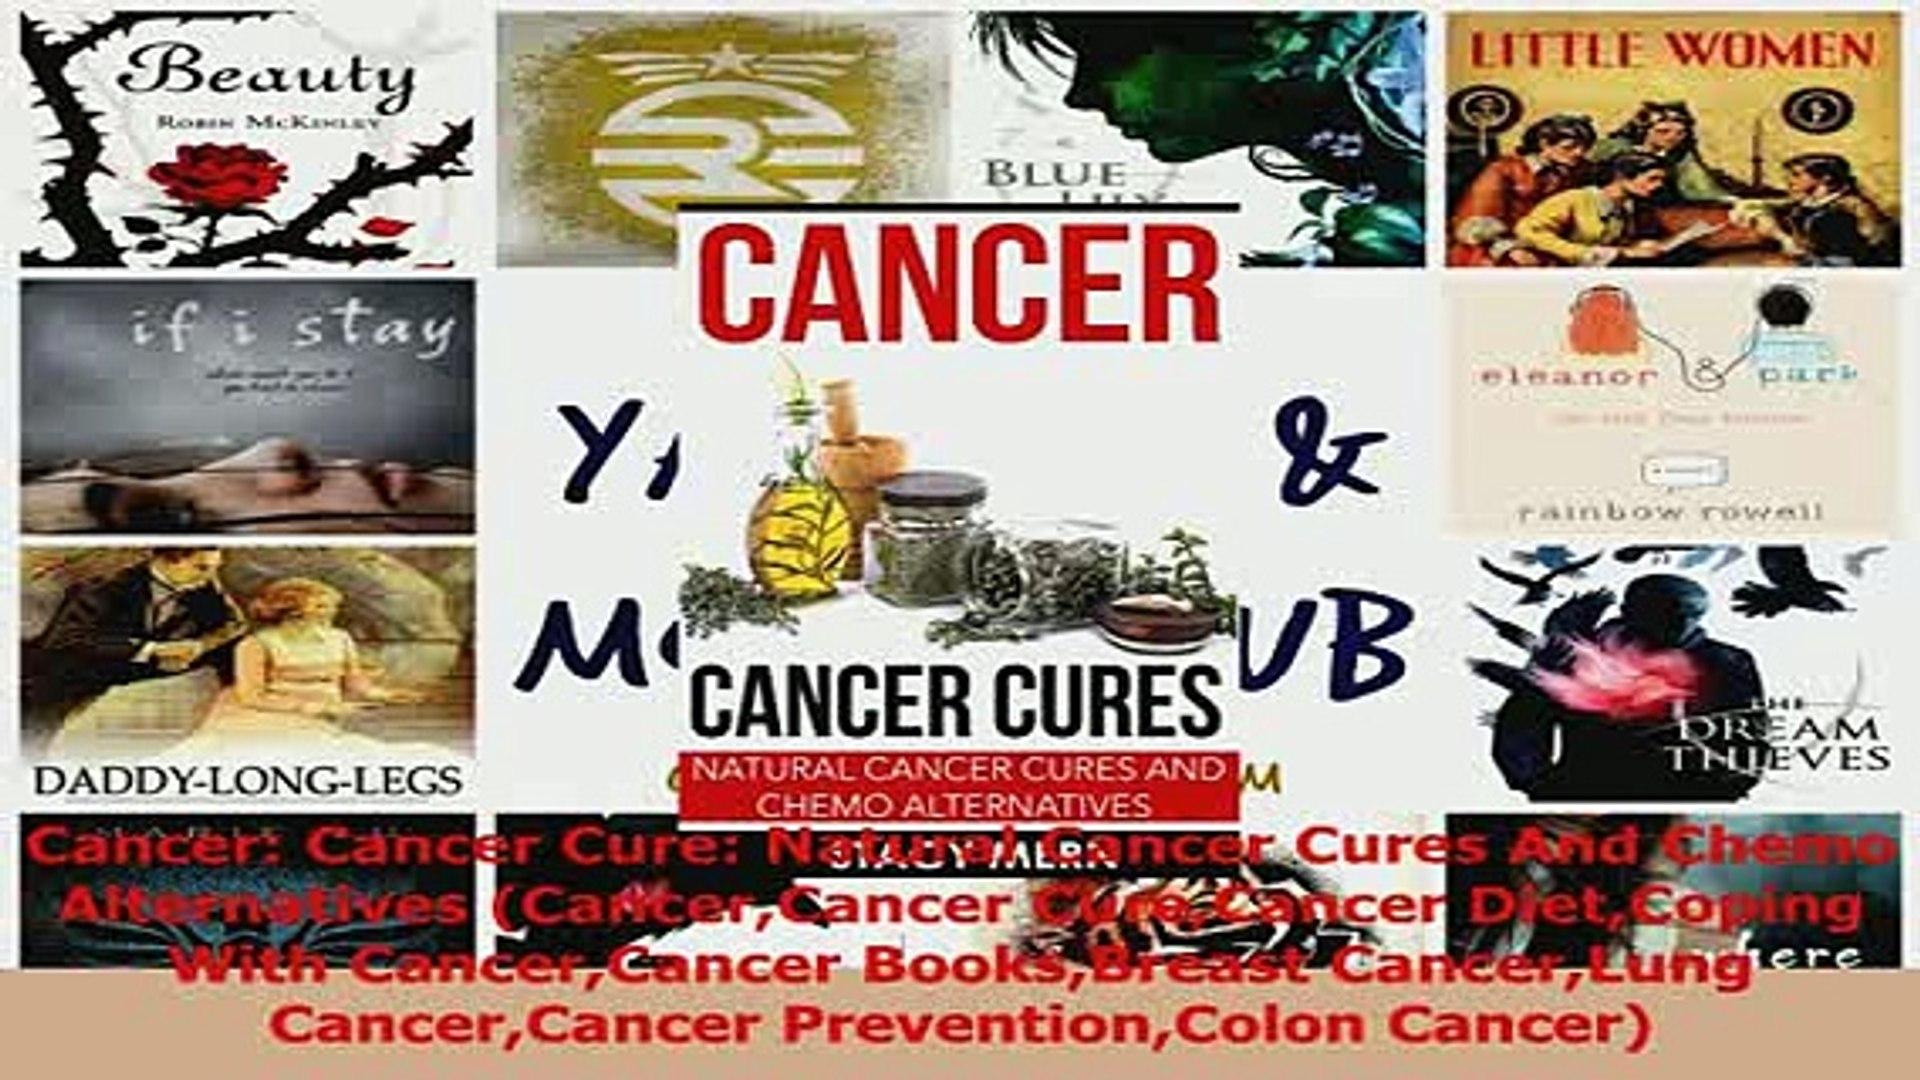 Download Cancer Cancer Cure Natural Cancer Cures And Chemo Alternatives  CancerCancer CureCancer Ebook Free